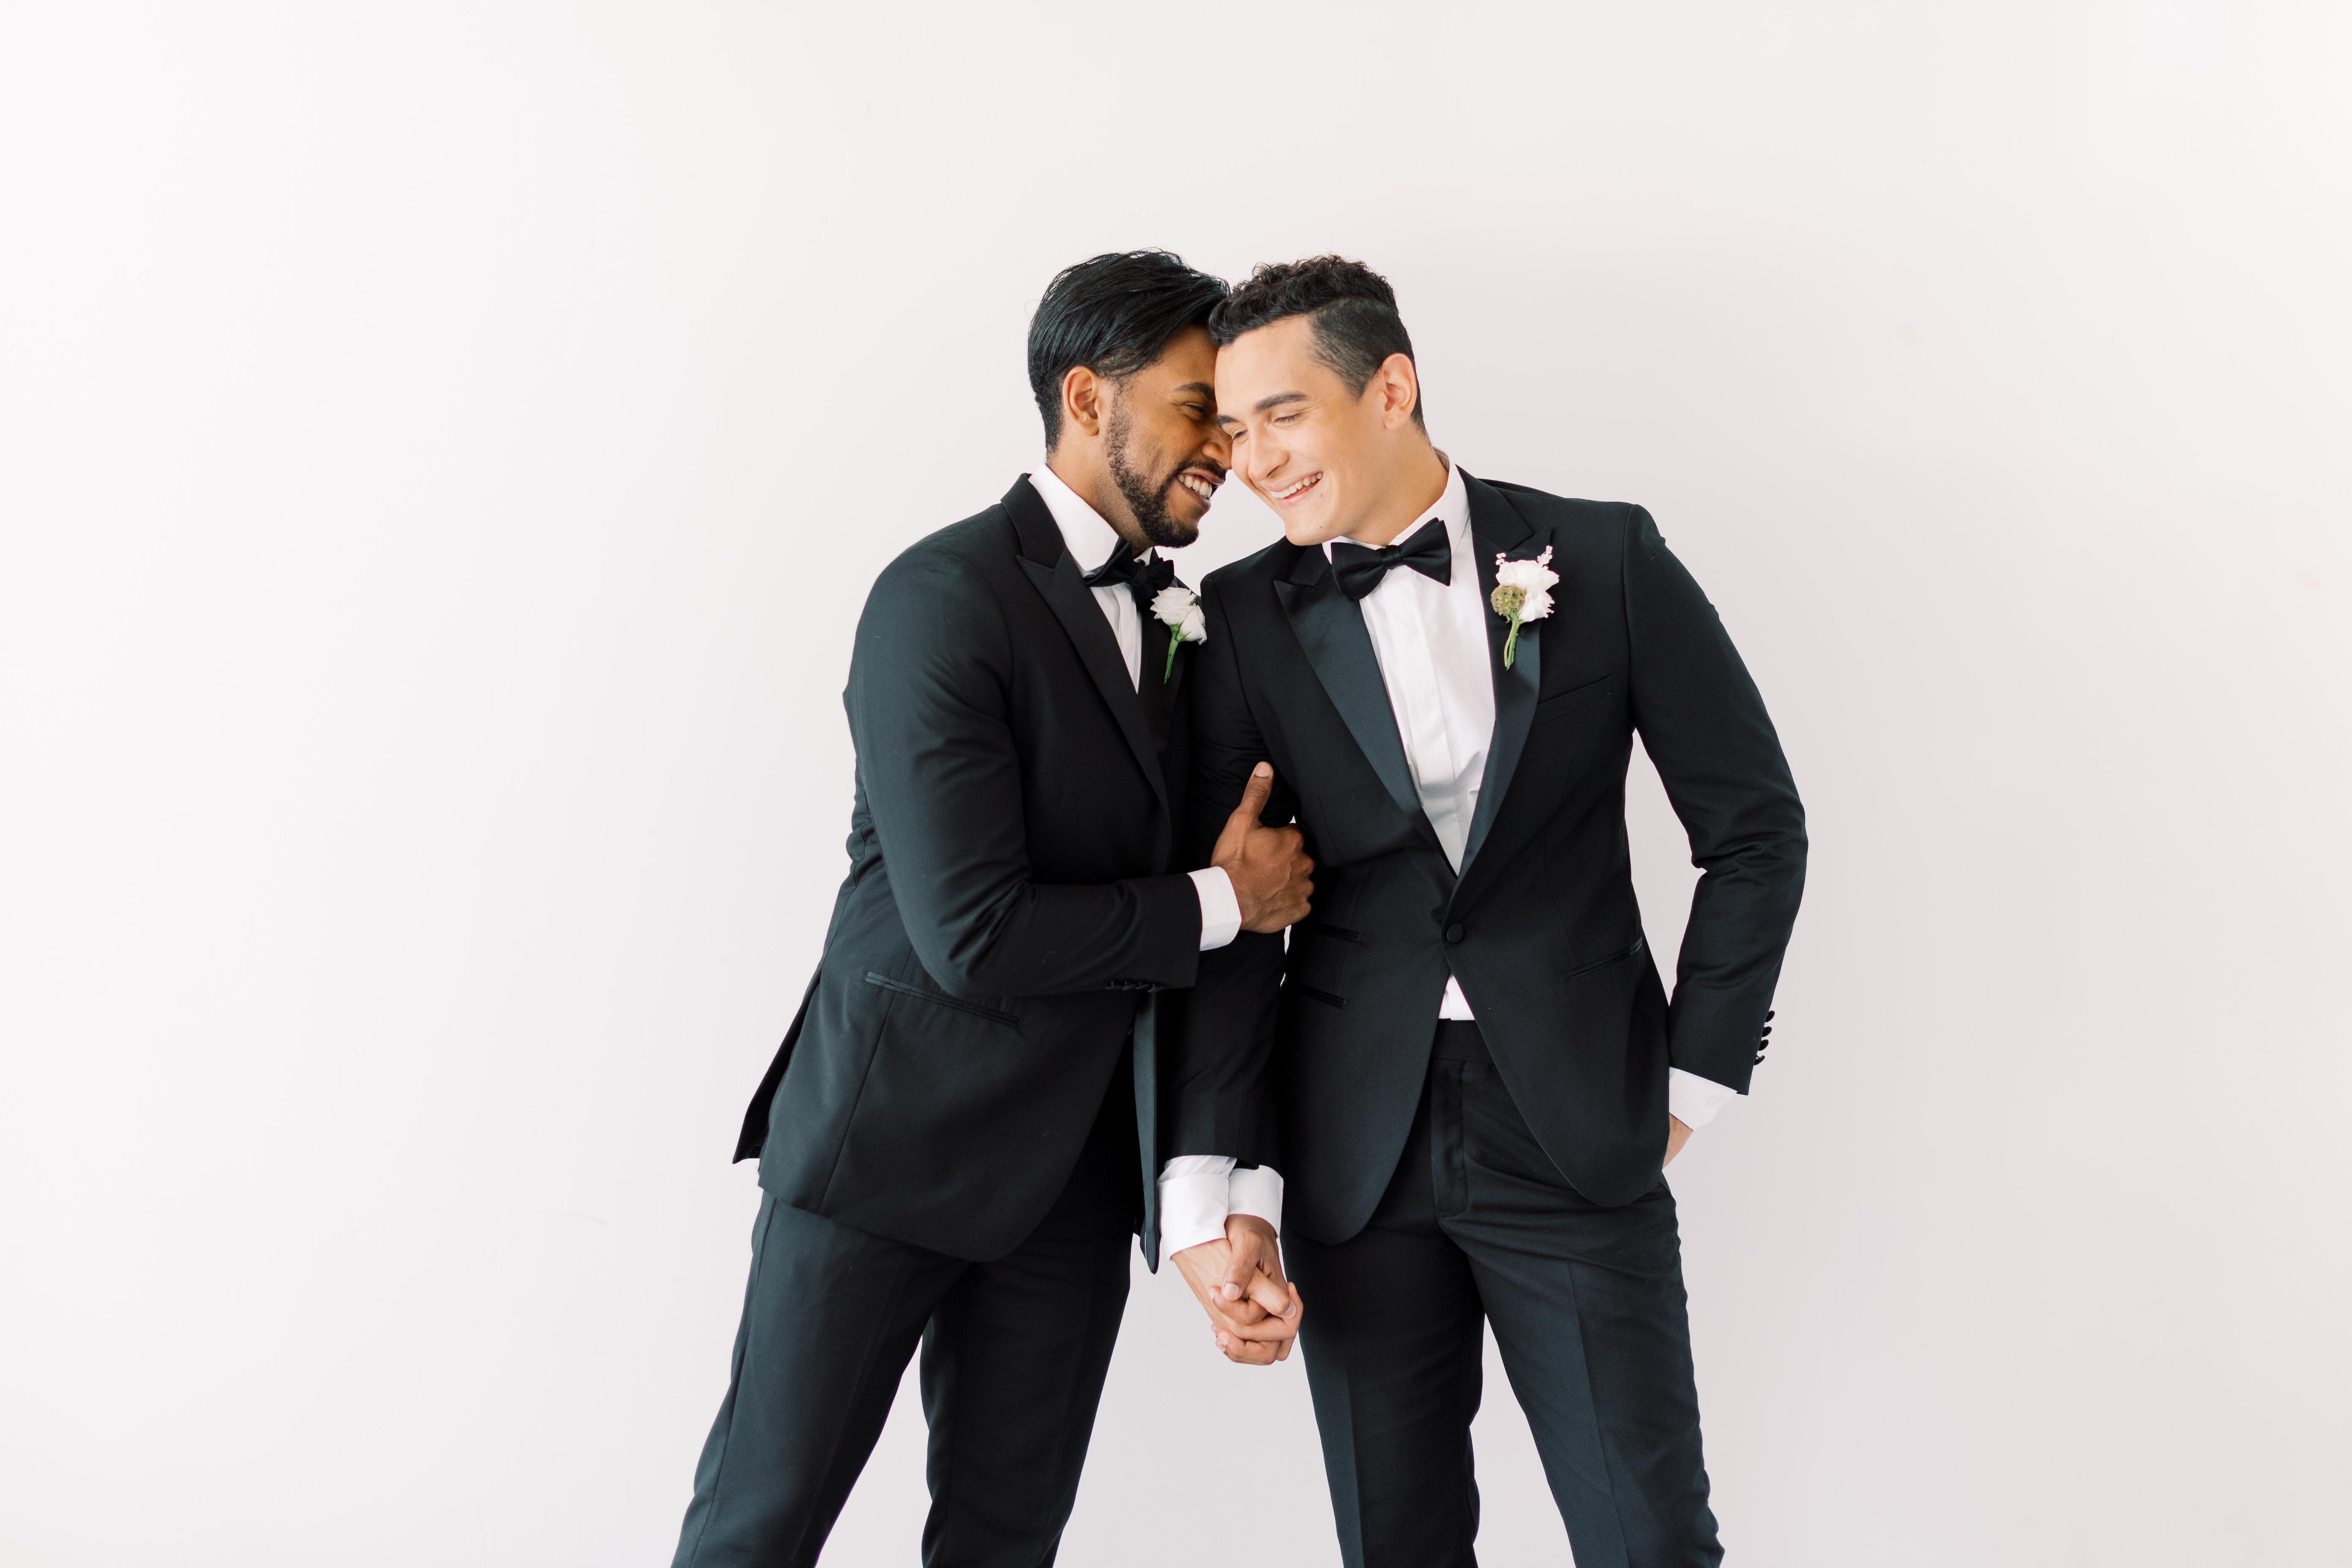 Stylish Grooms Wedding Suits